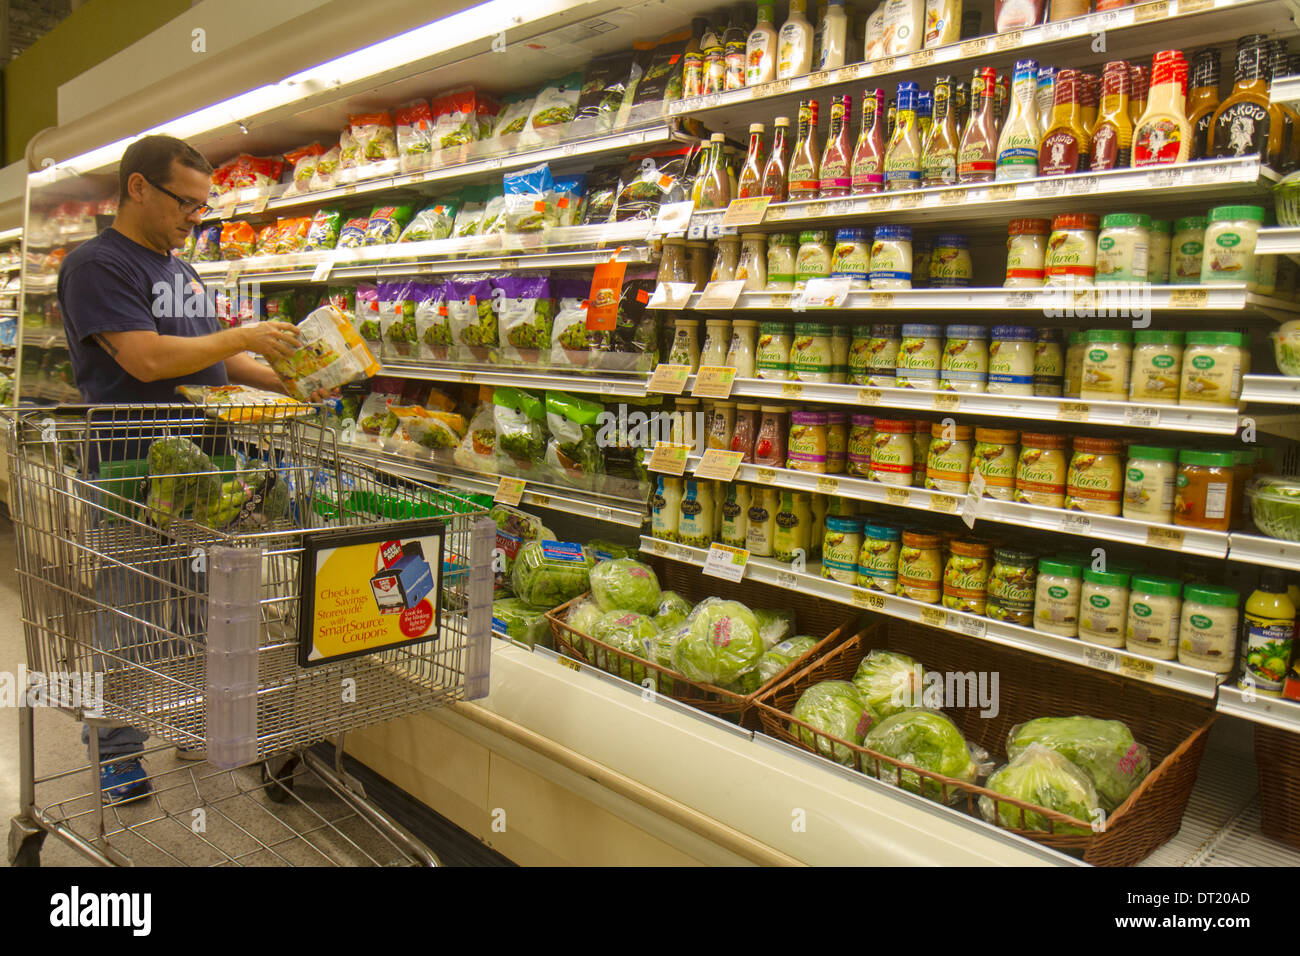 Florida Fl South Naples Publix Grocery Store Supermarket Food Stock Photo Alamy